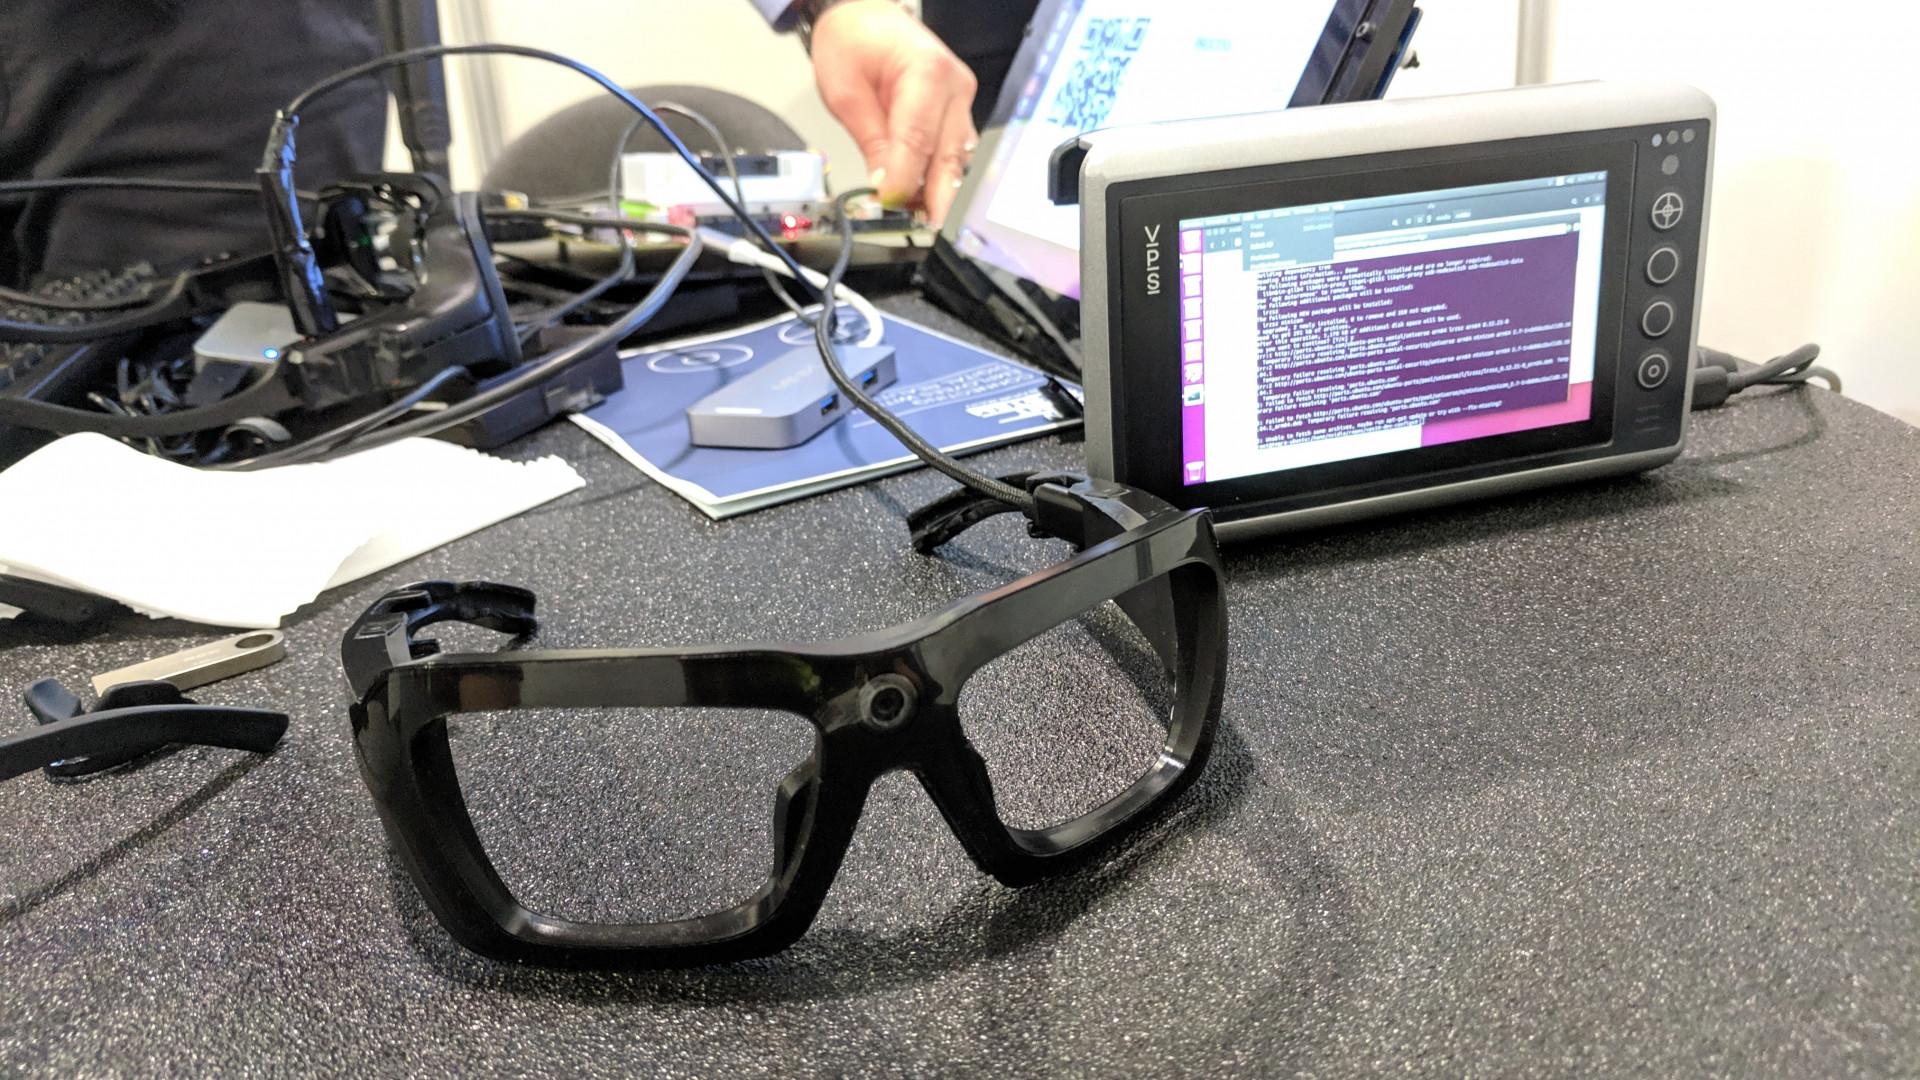 augmented reality mit eye tracking die gedankenlese. Black Bedroom Furniture Sets. Home Design Ideas